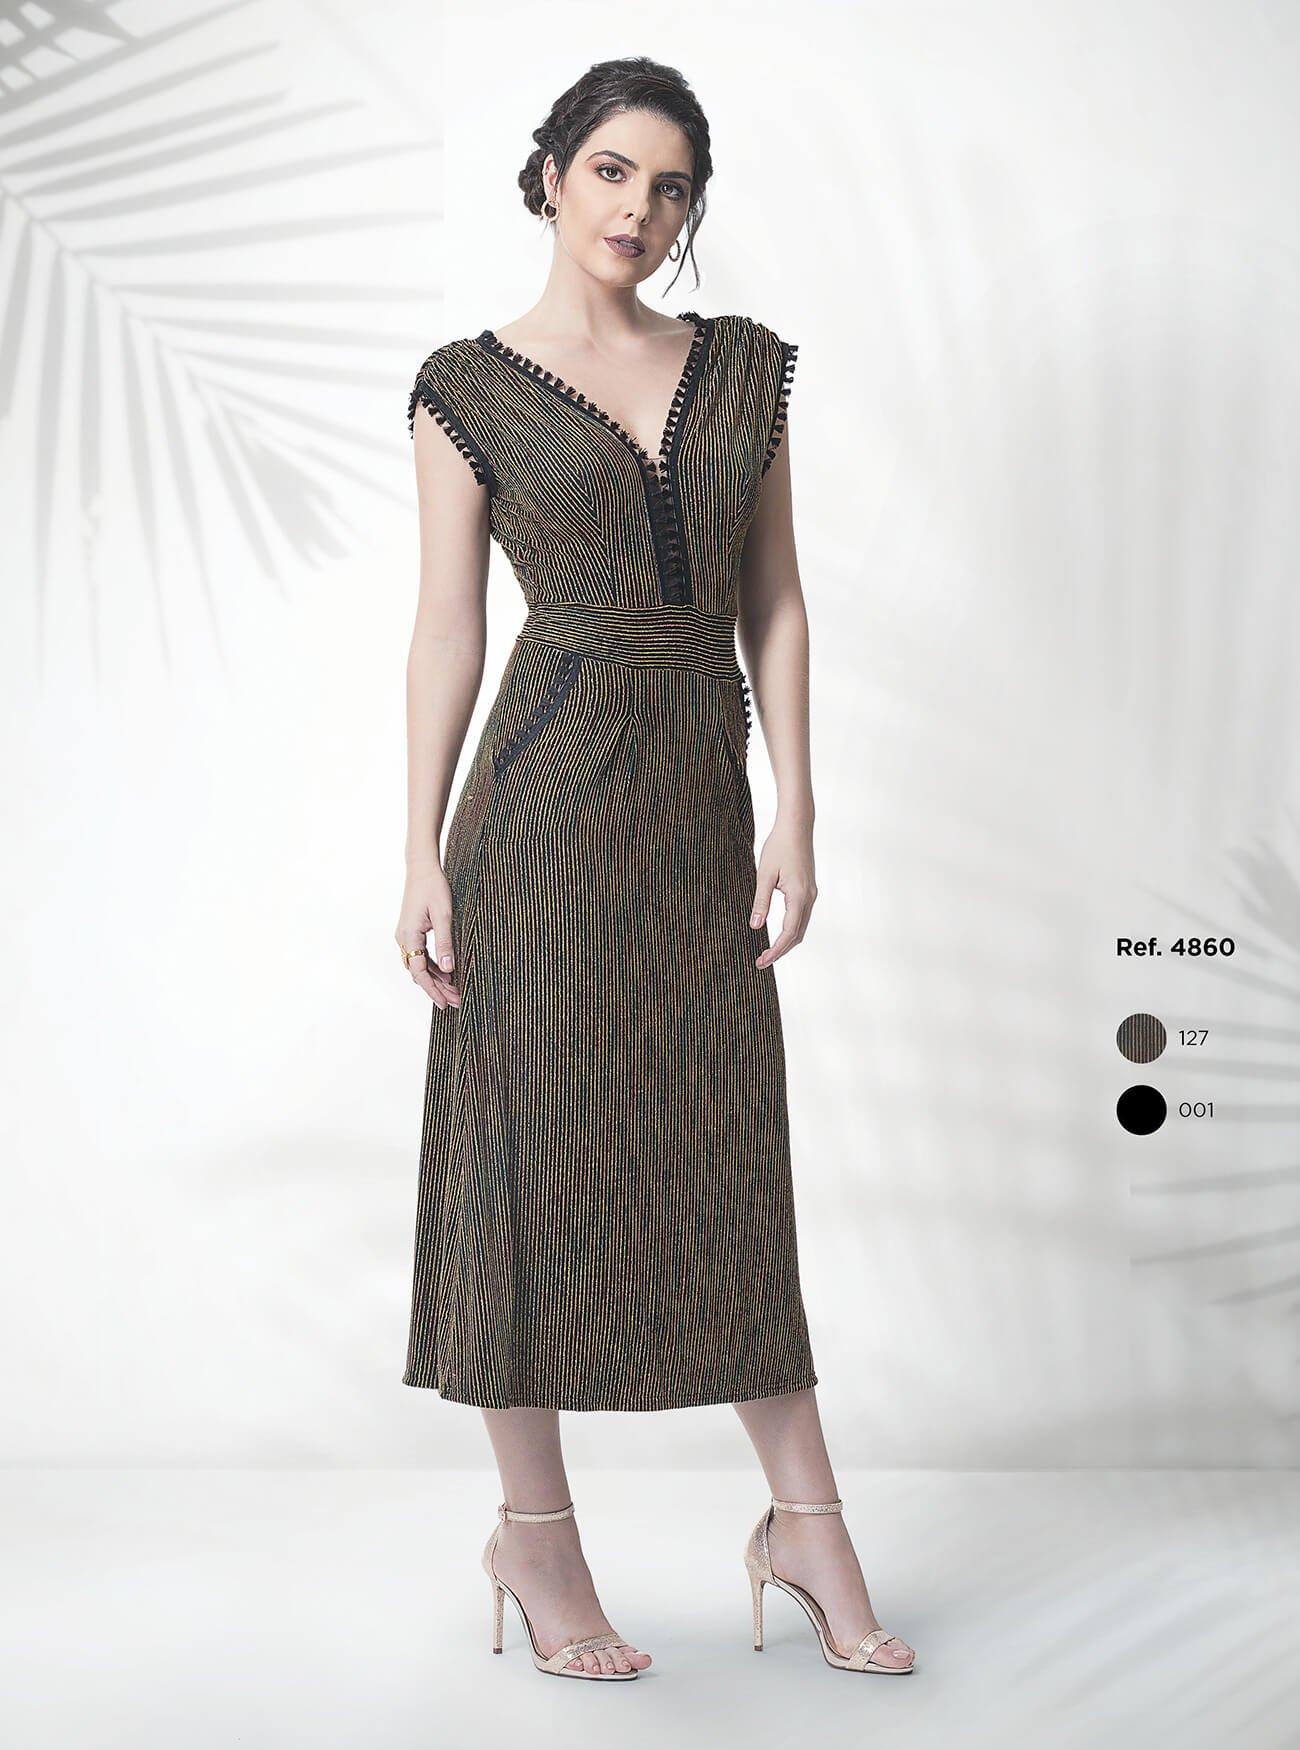 Vestido midi de malha com detalhe de franjas